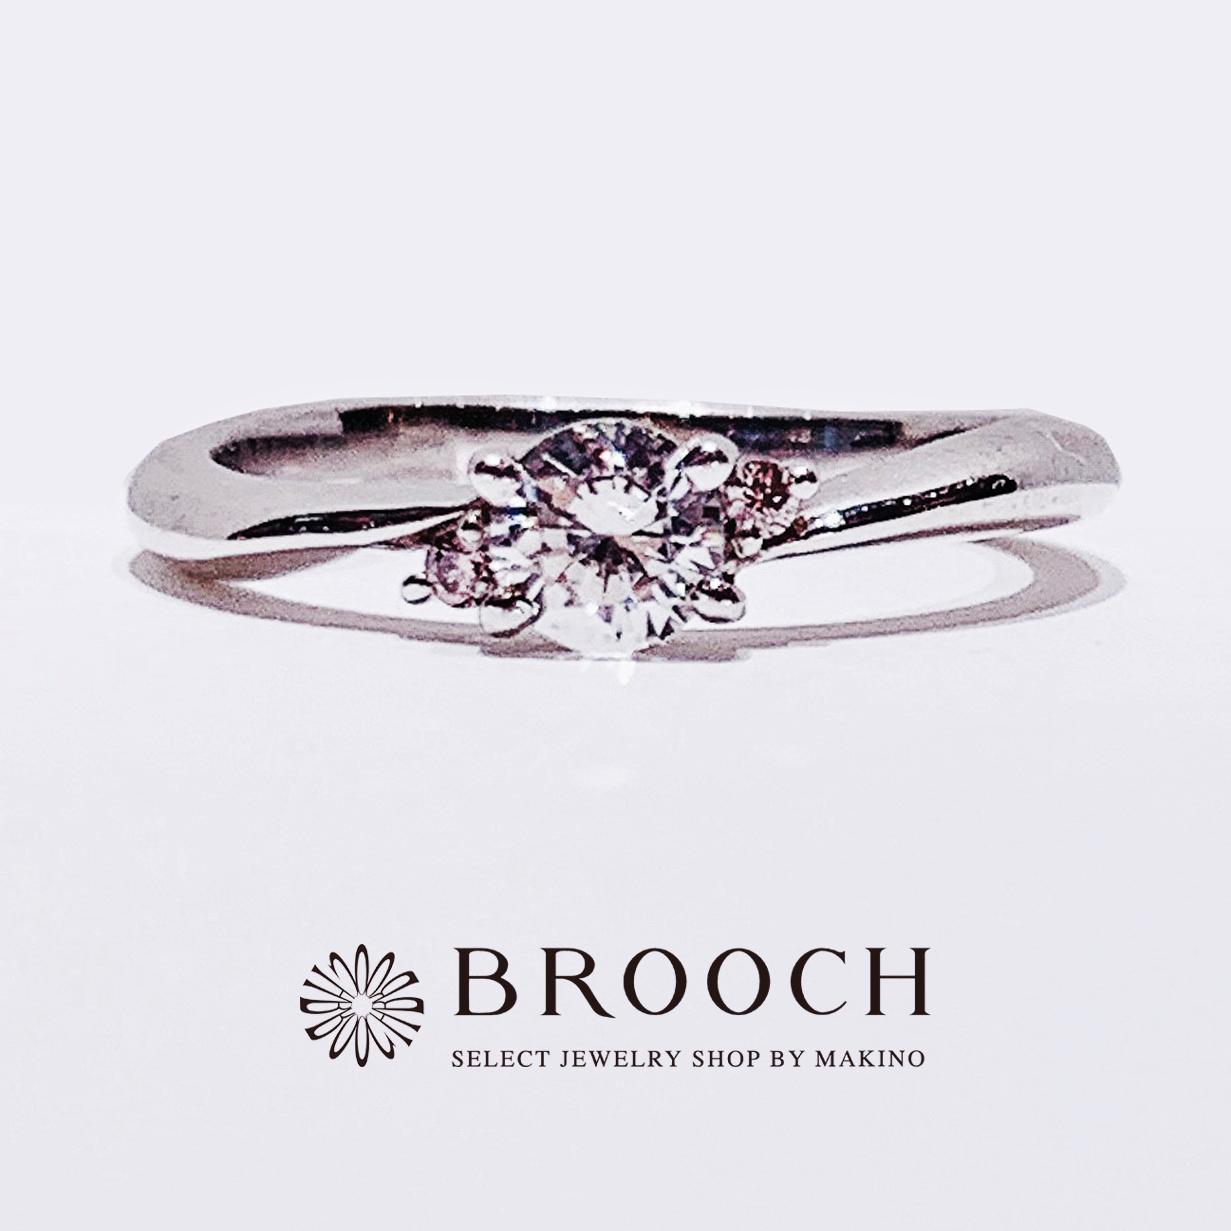 BROOCH 婚約指輪 エンゲージリング かわいい 両サイドピンク石ストレートデザイン